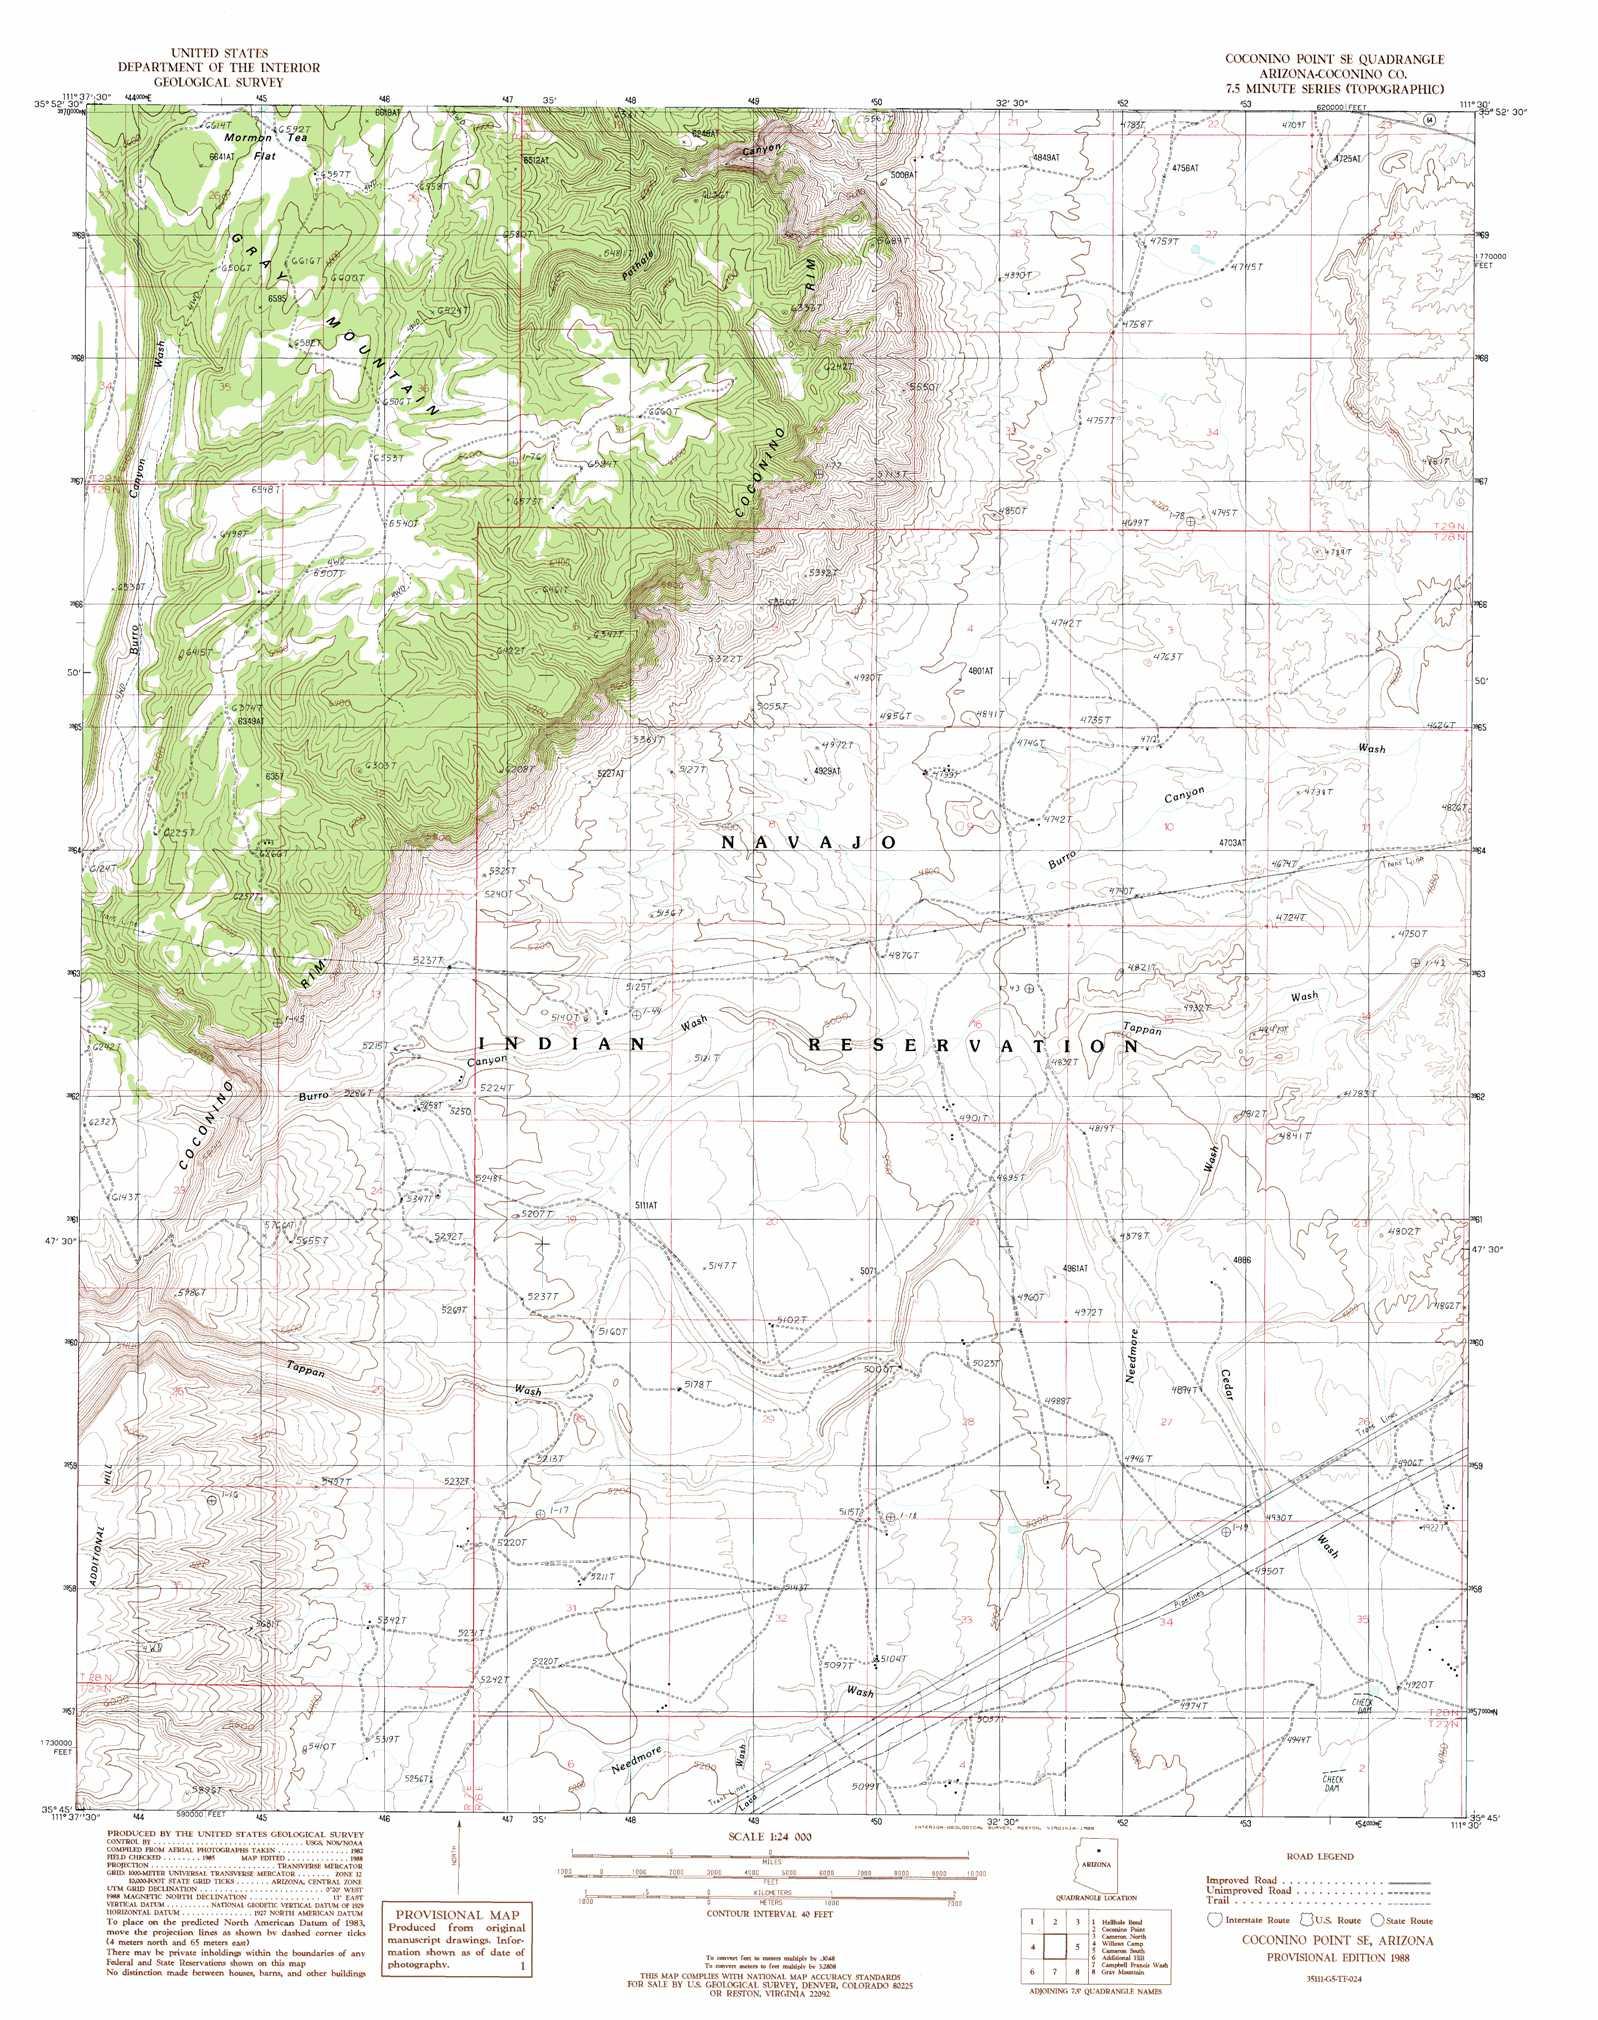 Coconino Point Se topographic map, AZ - USGS Topo Quad 35111g5